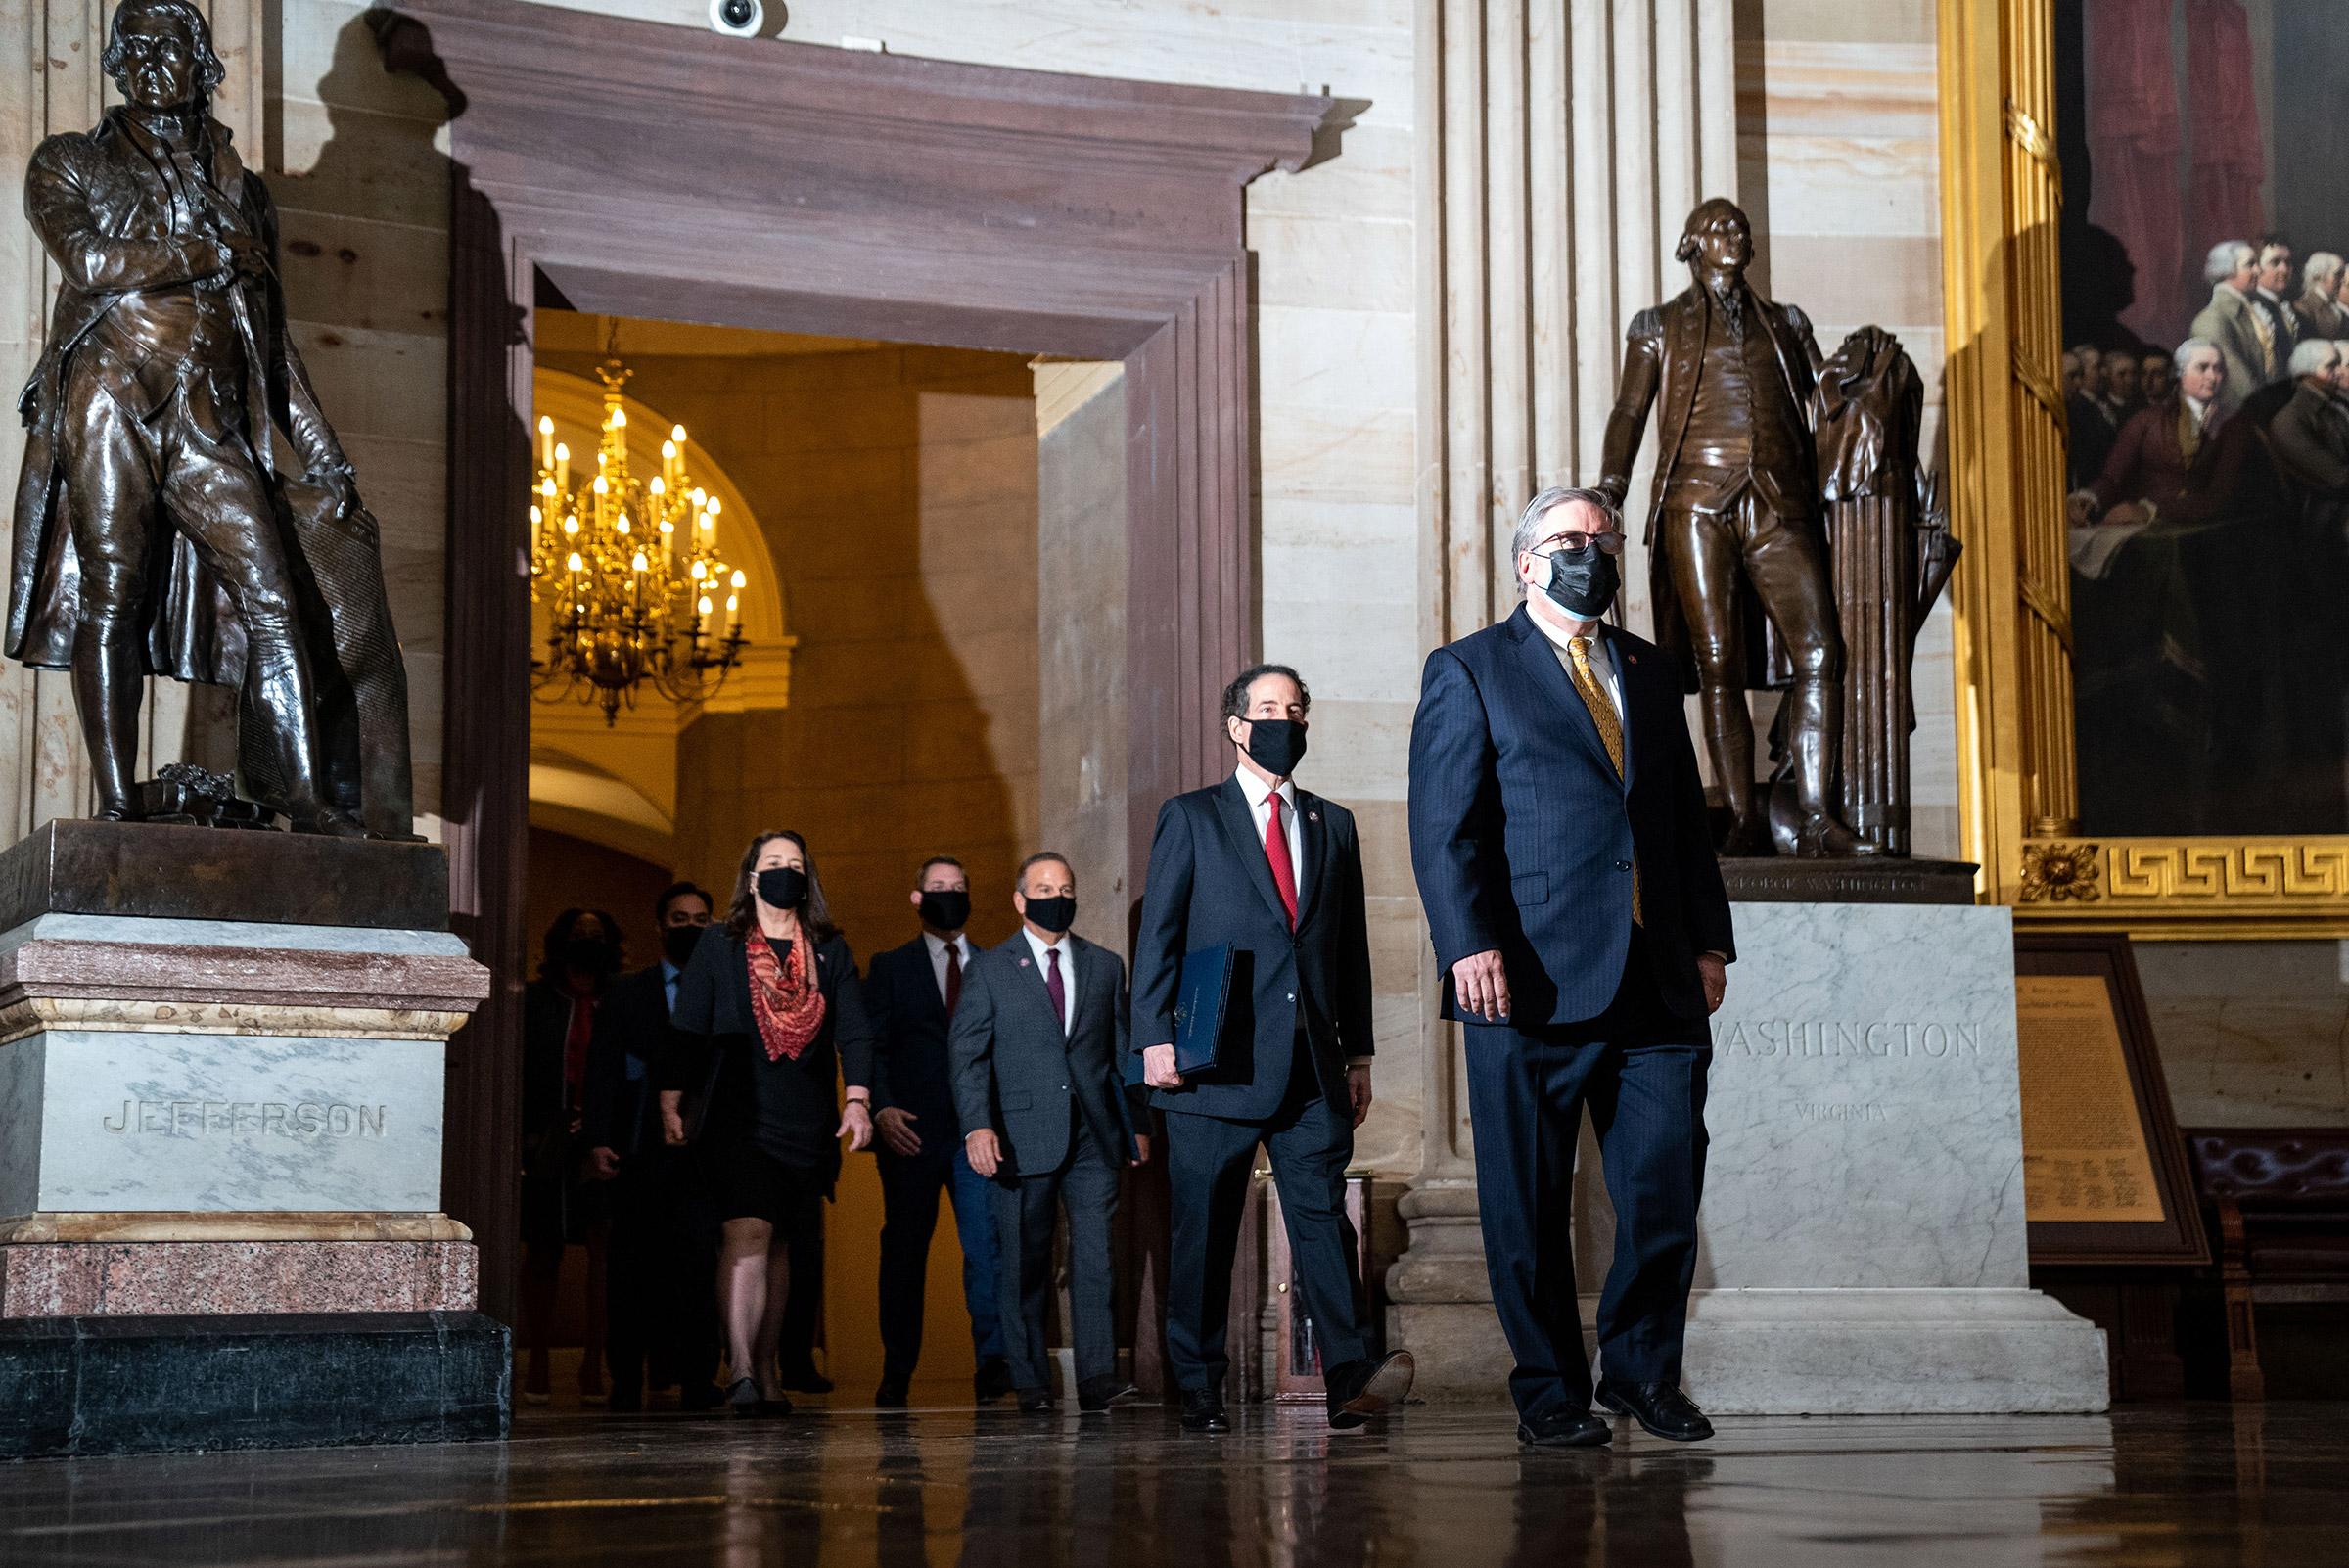 House impeachment managers, lead by Rep. Jamie Raskin, walk through the Rotunda of the U.S. Capitol in Washington on Feb. 9, 2021.